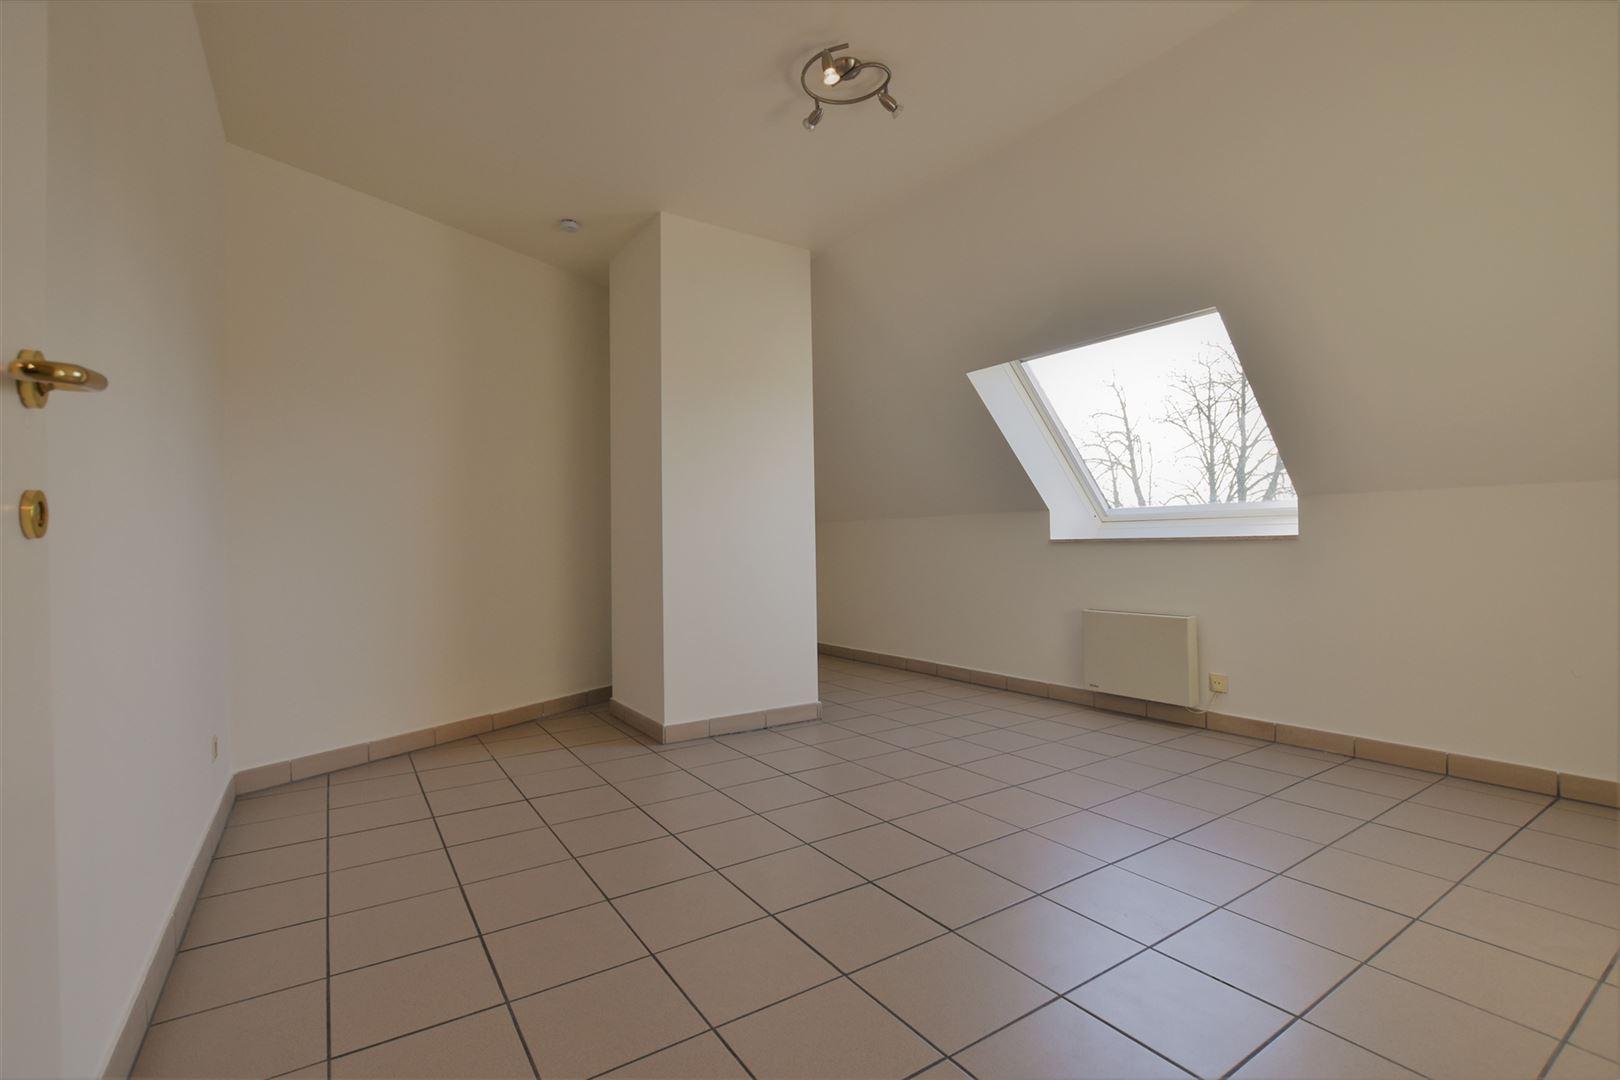 Foto 12 : Appartement te 9280 Lebbeke (België) - Prijs € 645